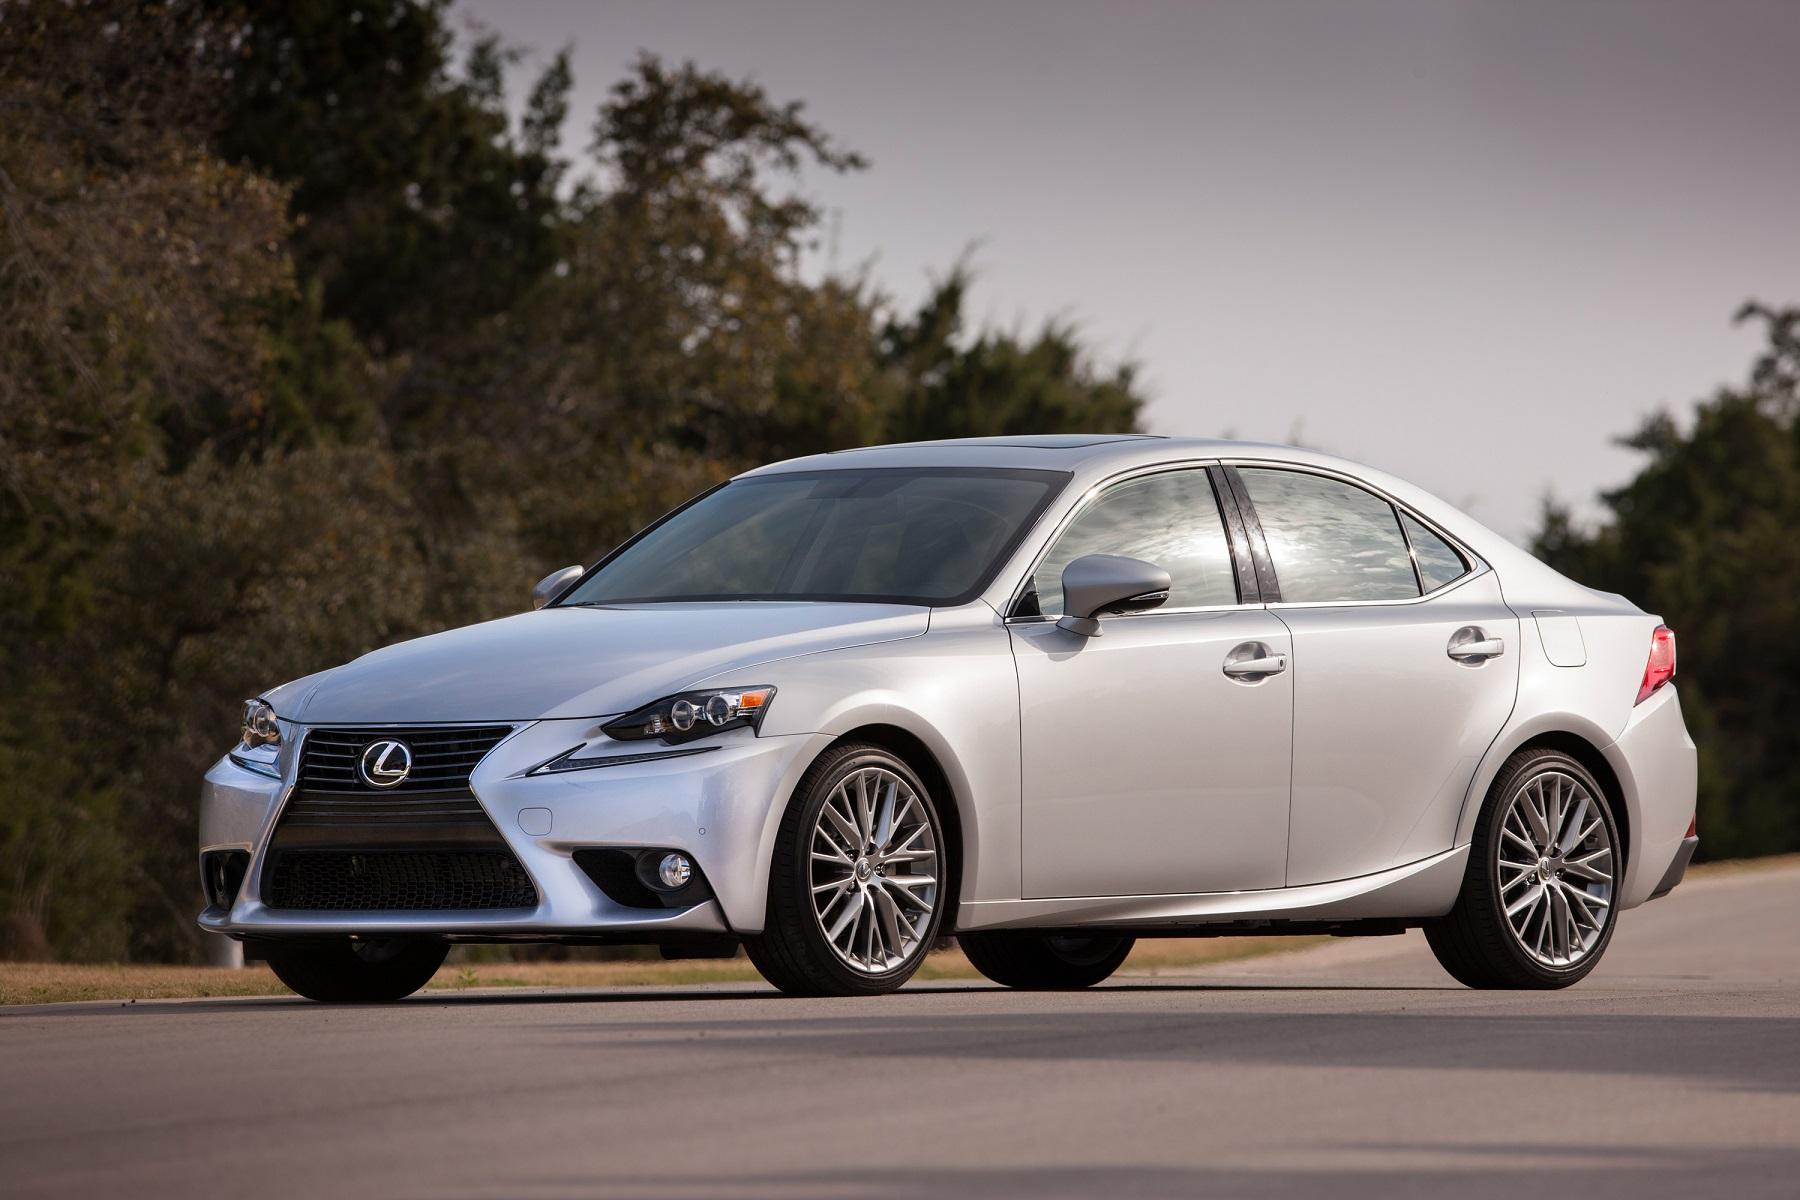 Lexus 2014 IS Aggressive Elegance New on Wheels GrooveCar